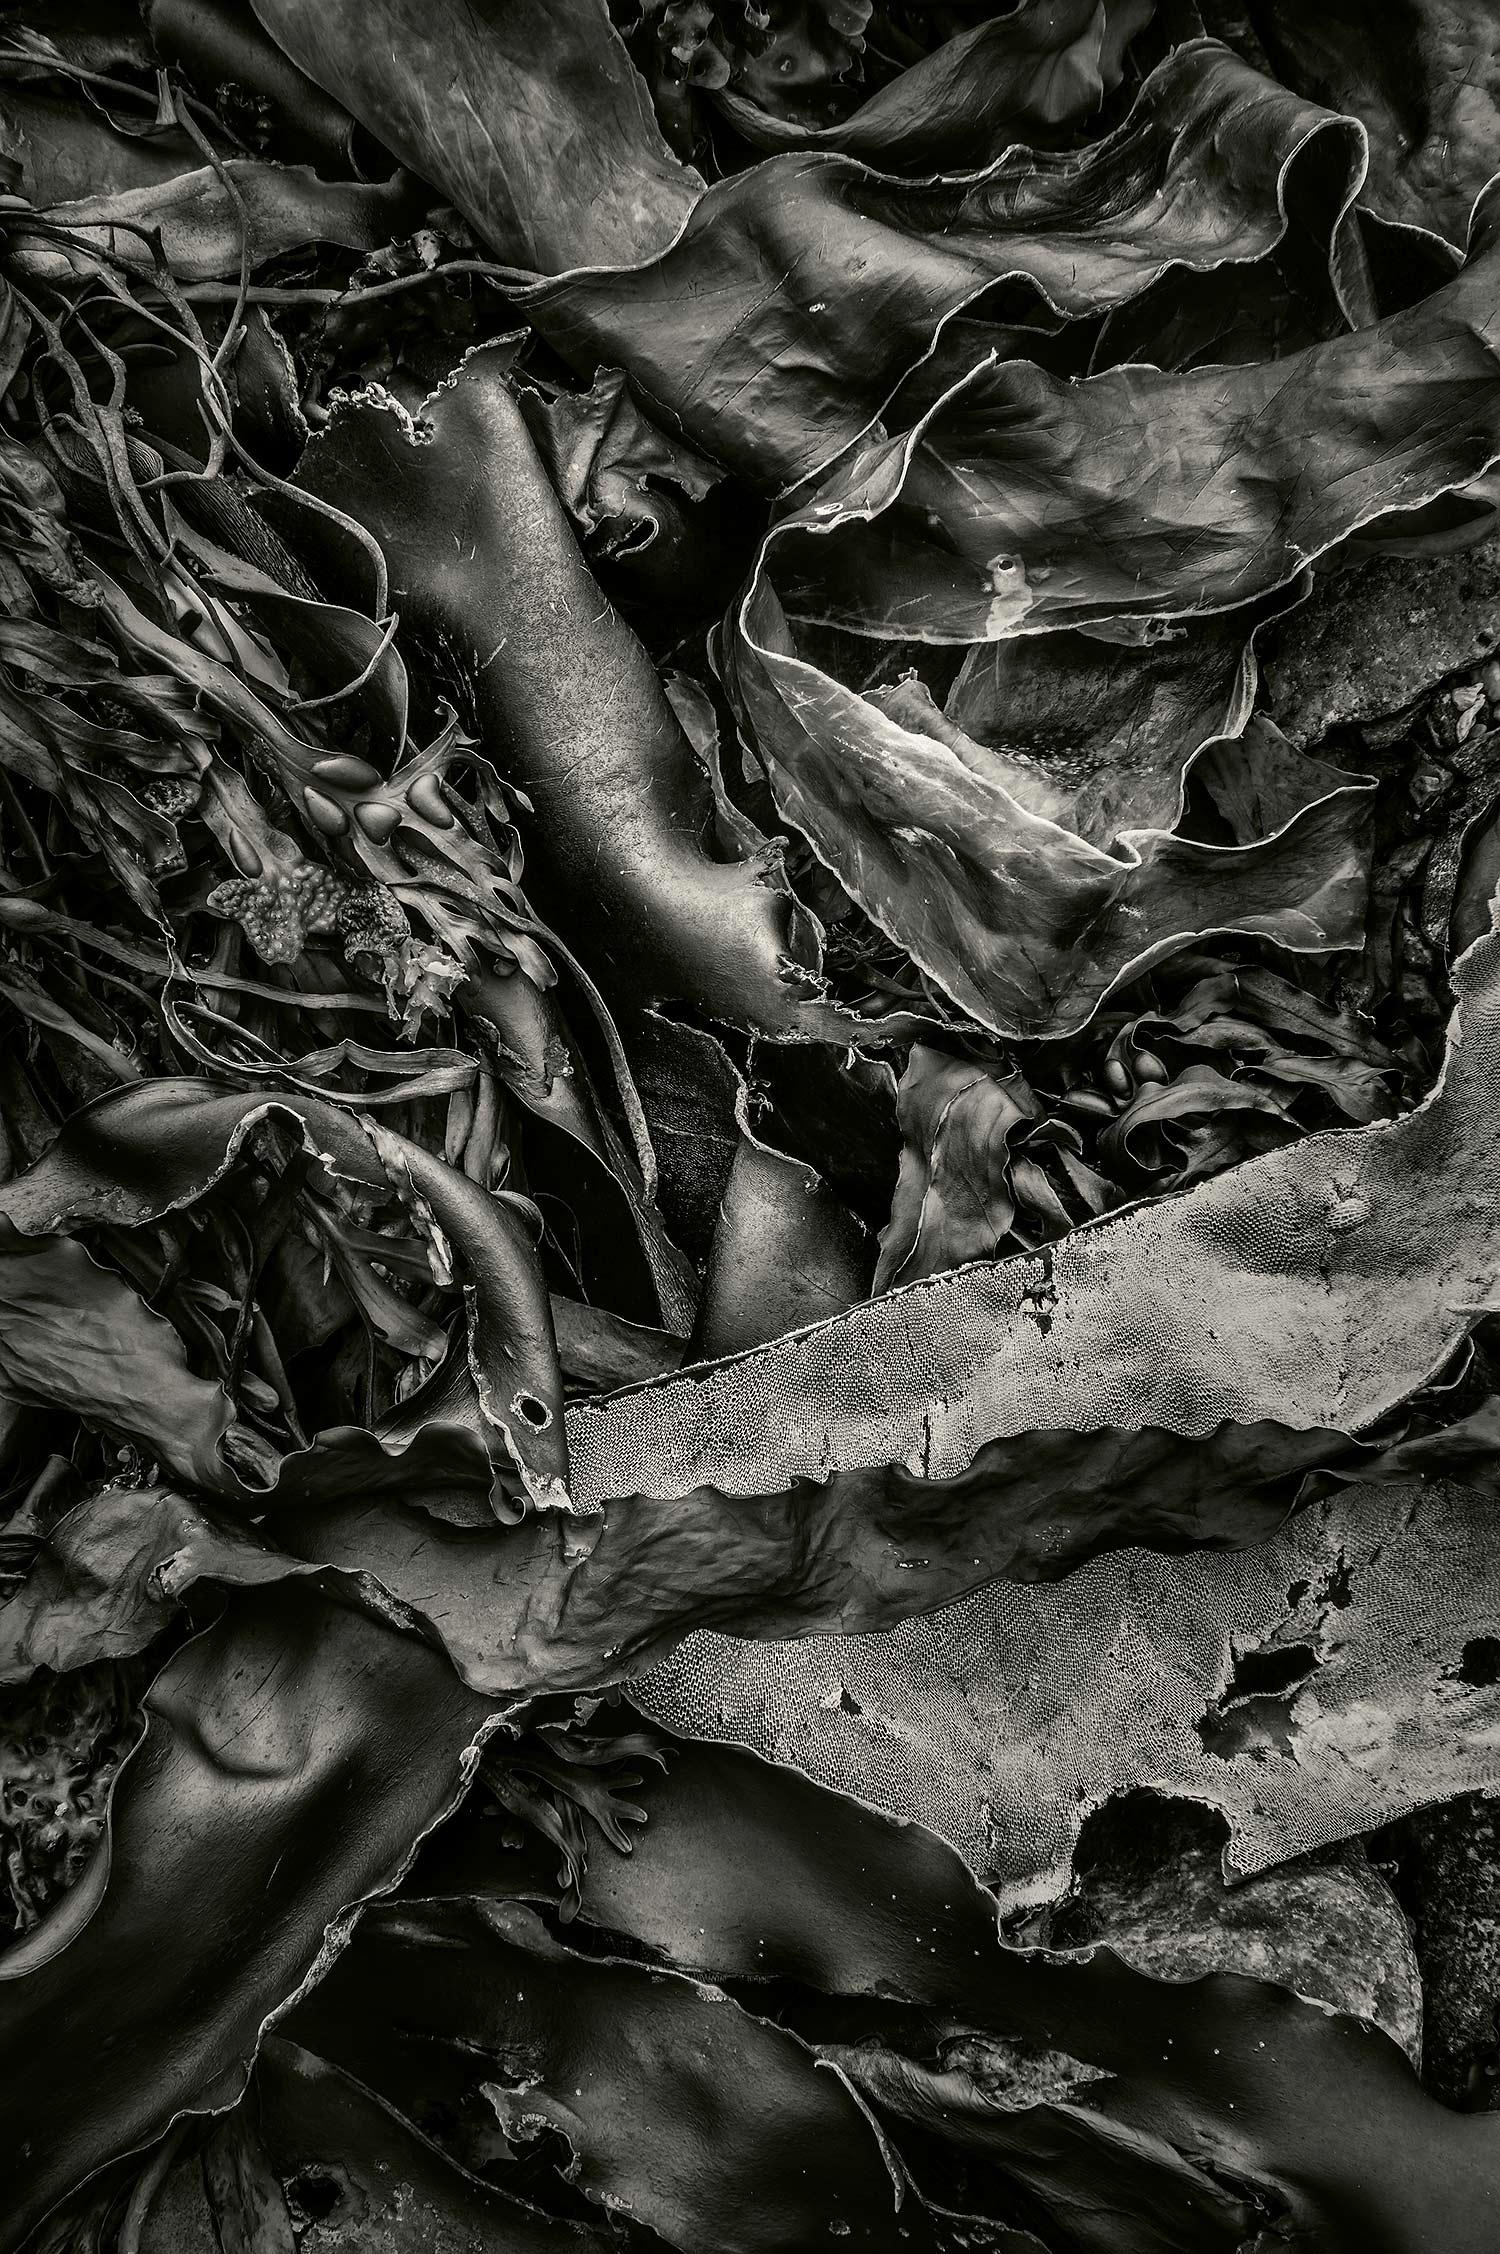 Seaweed 568, Seawall, Maine, 2012